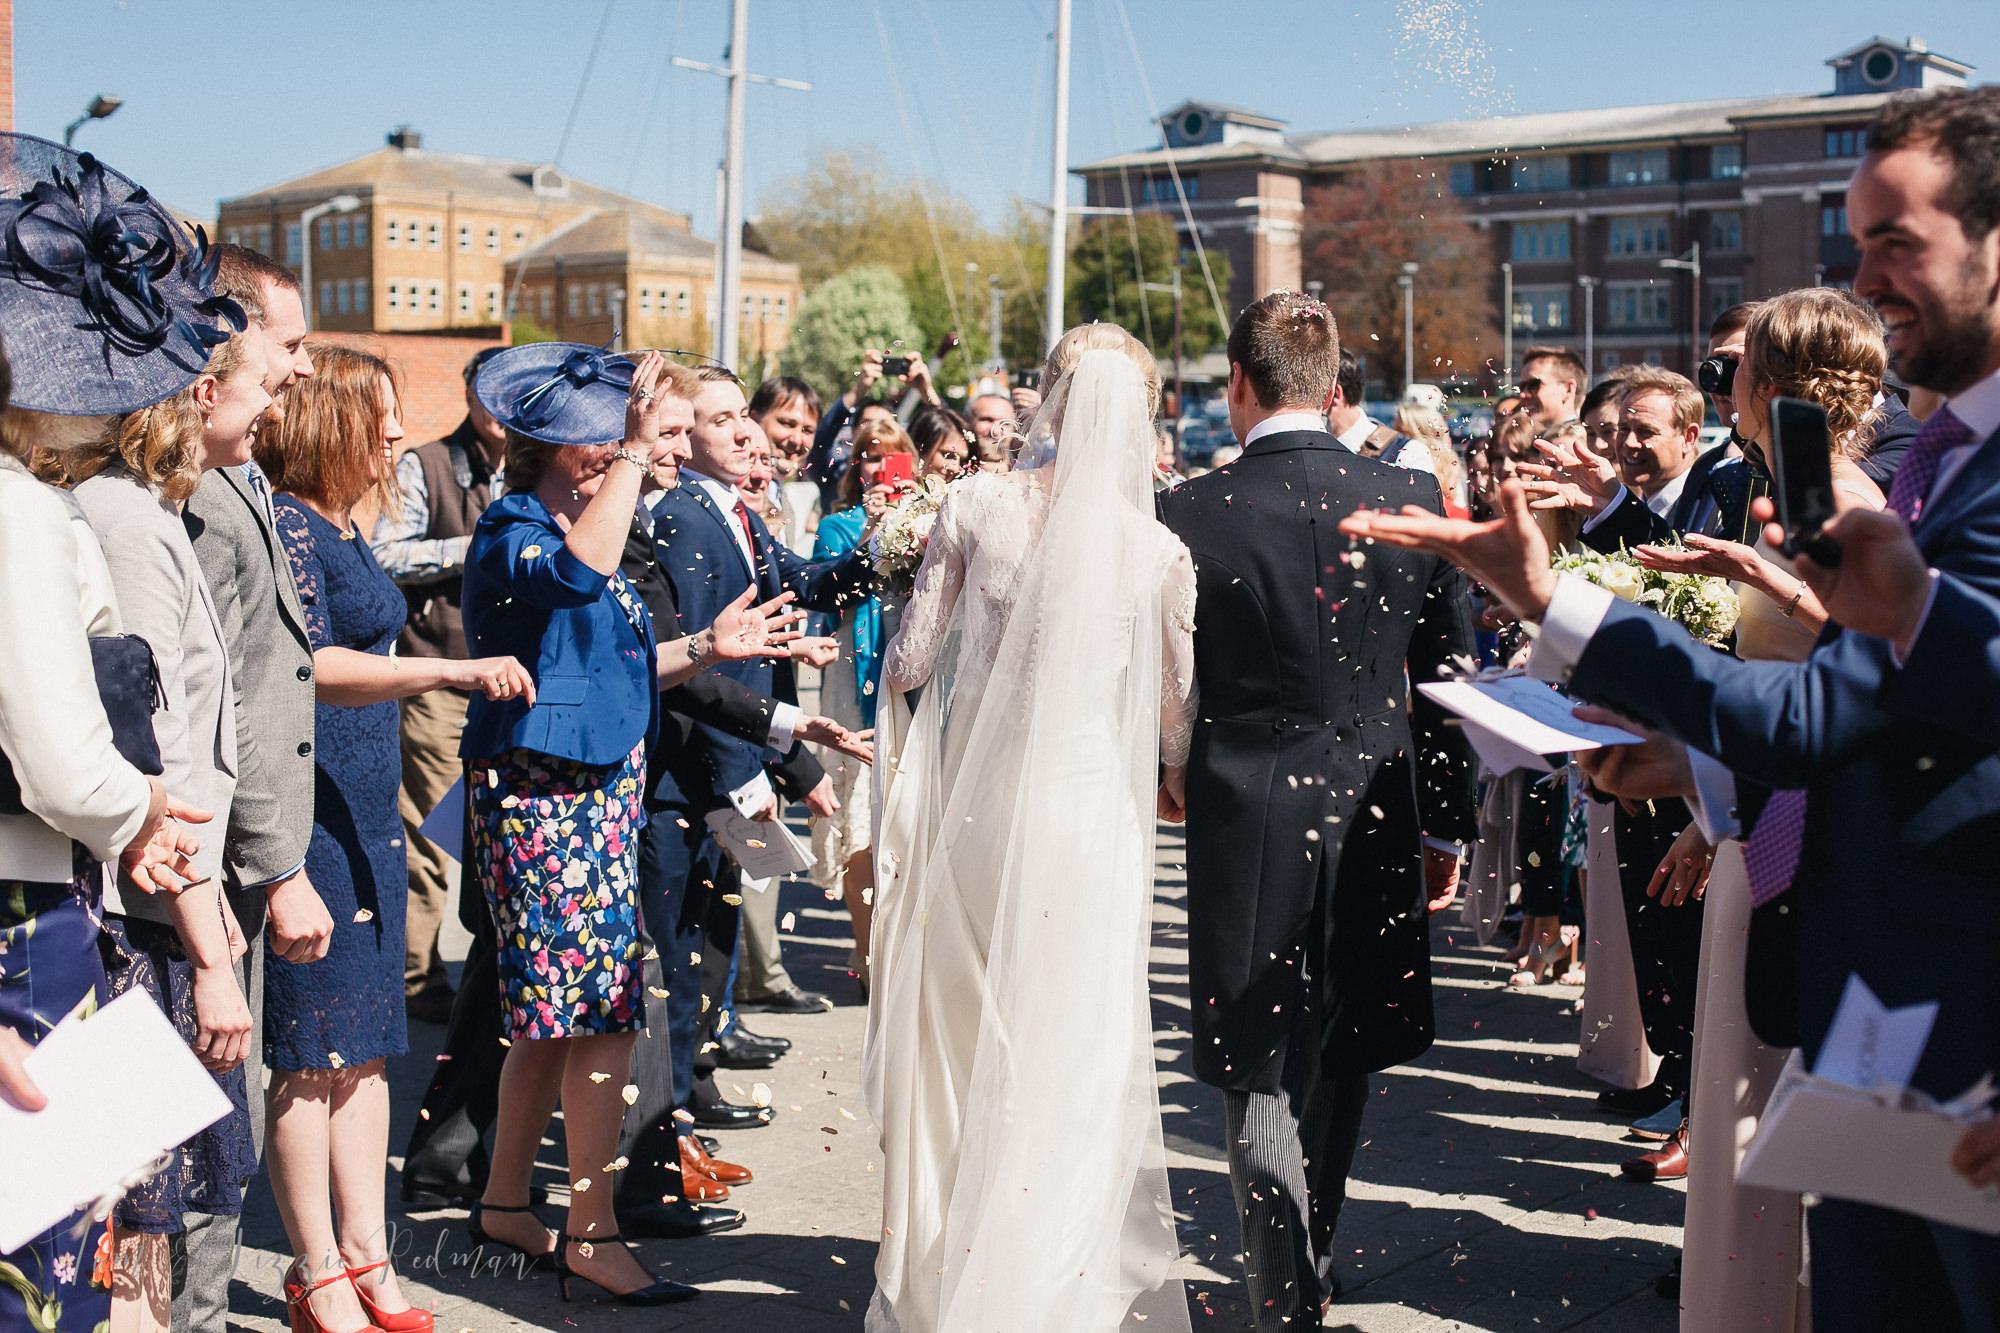 Dorset wedding photographers Tom & Lizzie Redman 024.jpg